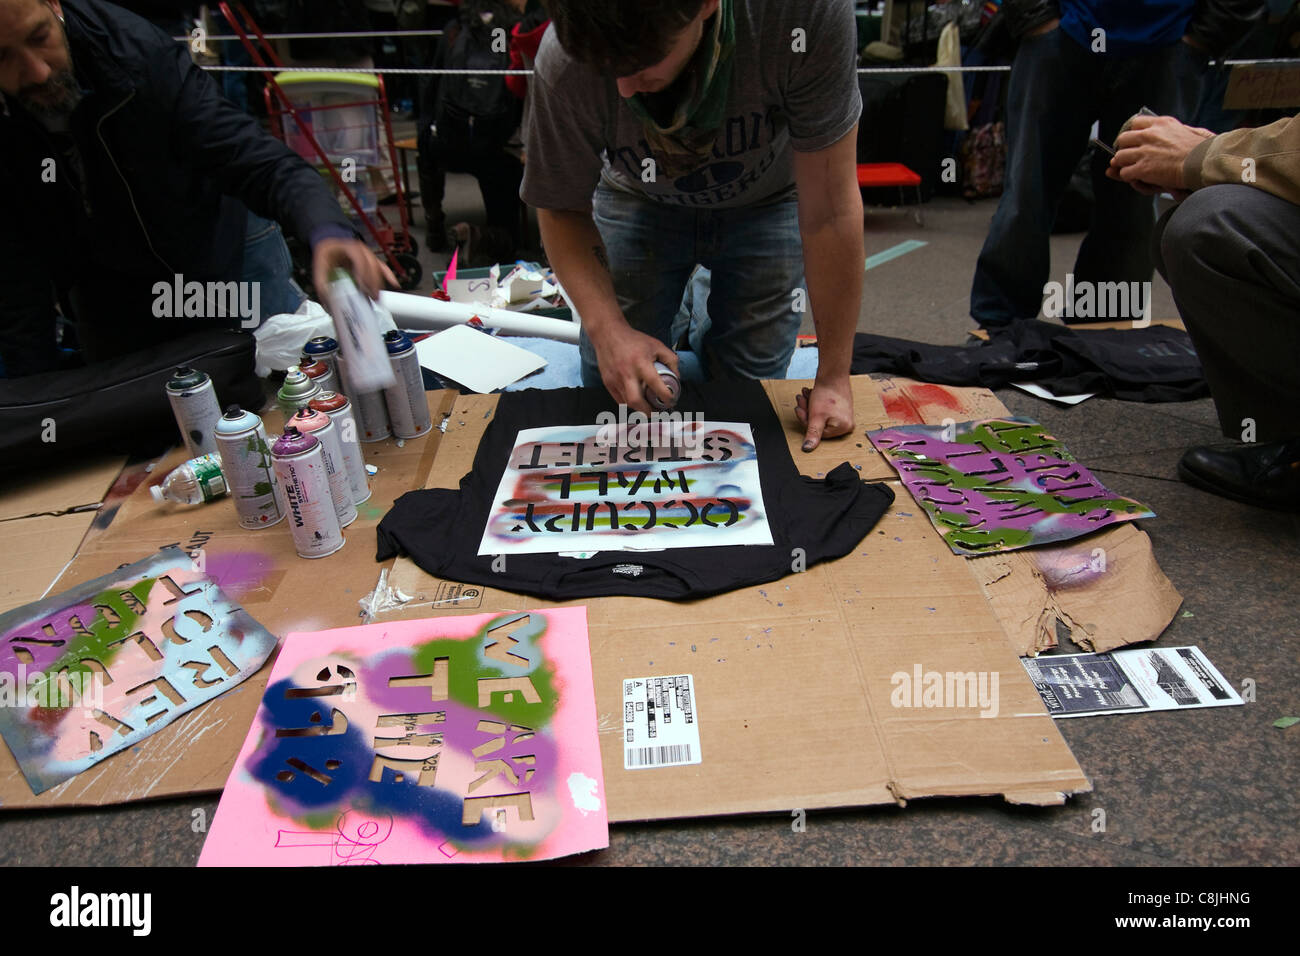 "Occupy Wall Street manifestant pistolage ""OCCUPER WALL STREET"" sur un T-shirt noir à l'intérieur Photo Stock"